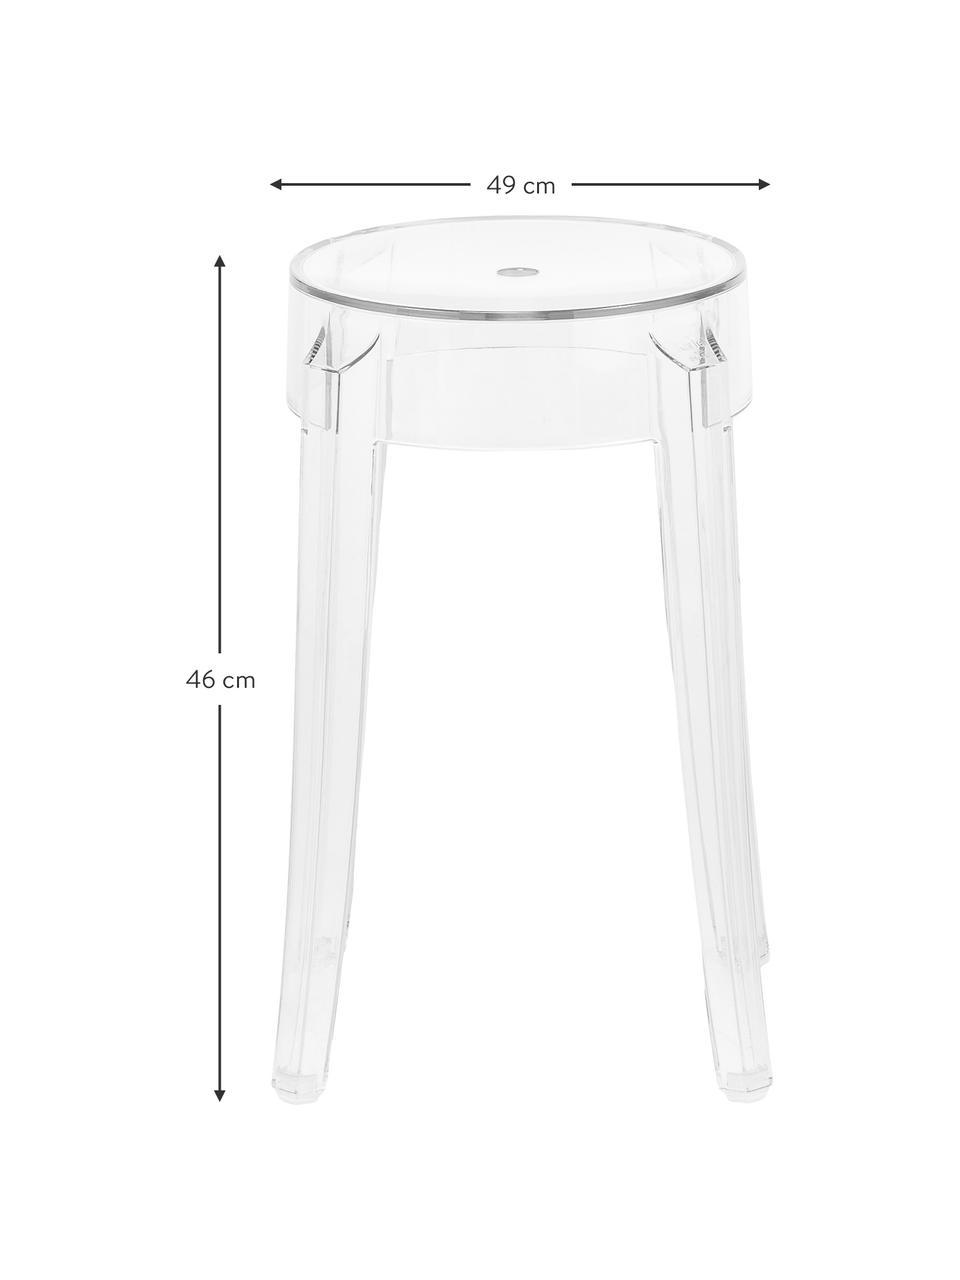 Sgabello / tavolino trasparente Charles Ghost, Policarbonato, Trasparente, Ø 39 x Alt. 46 cm